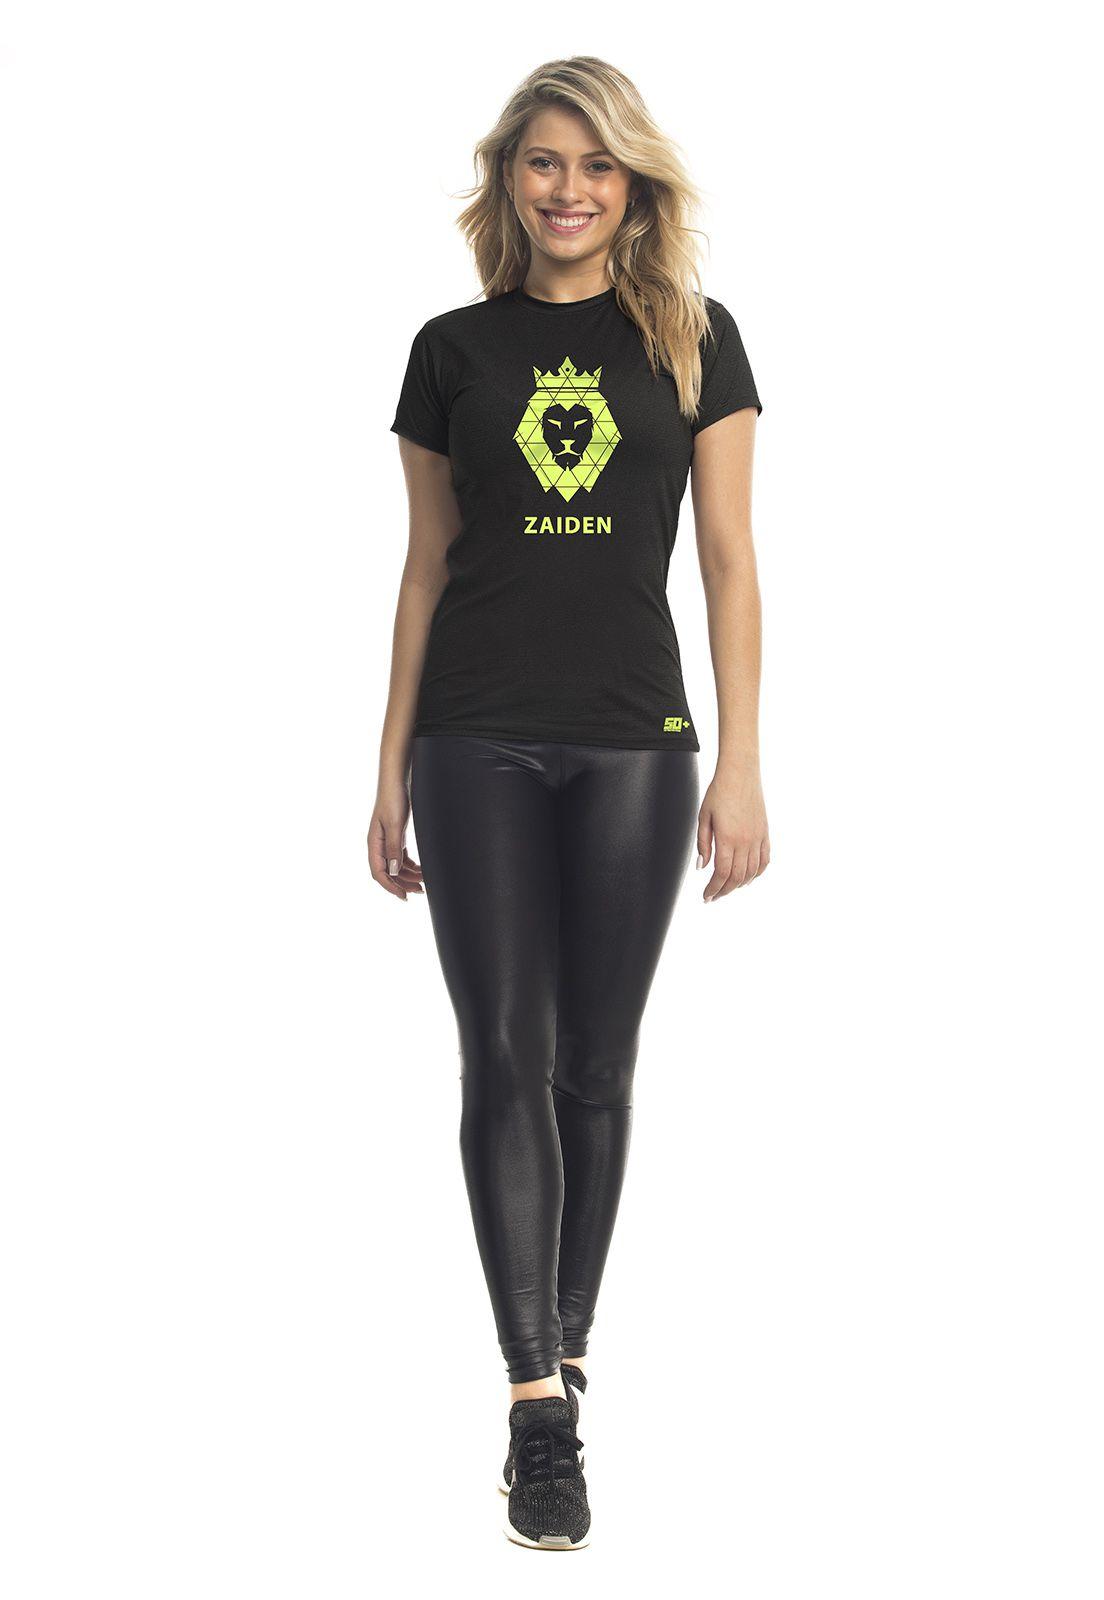 Camiseta Feminina Poliamida ZAIDEN Preta Leão Amarelo